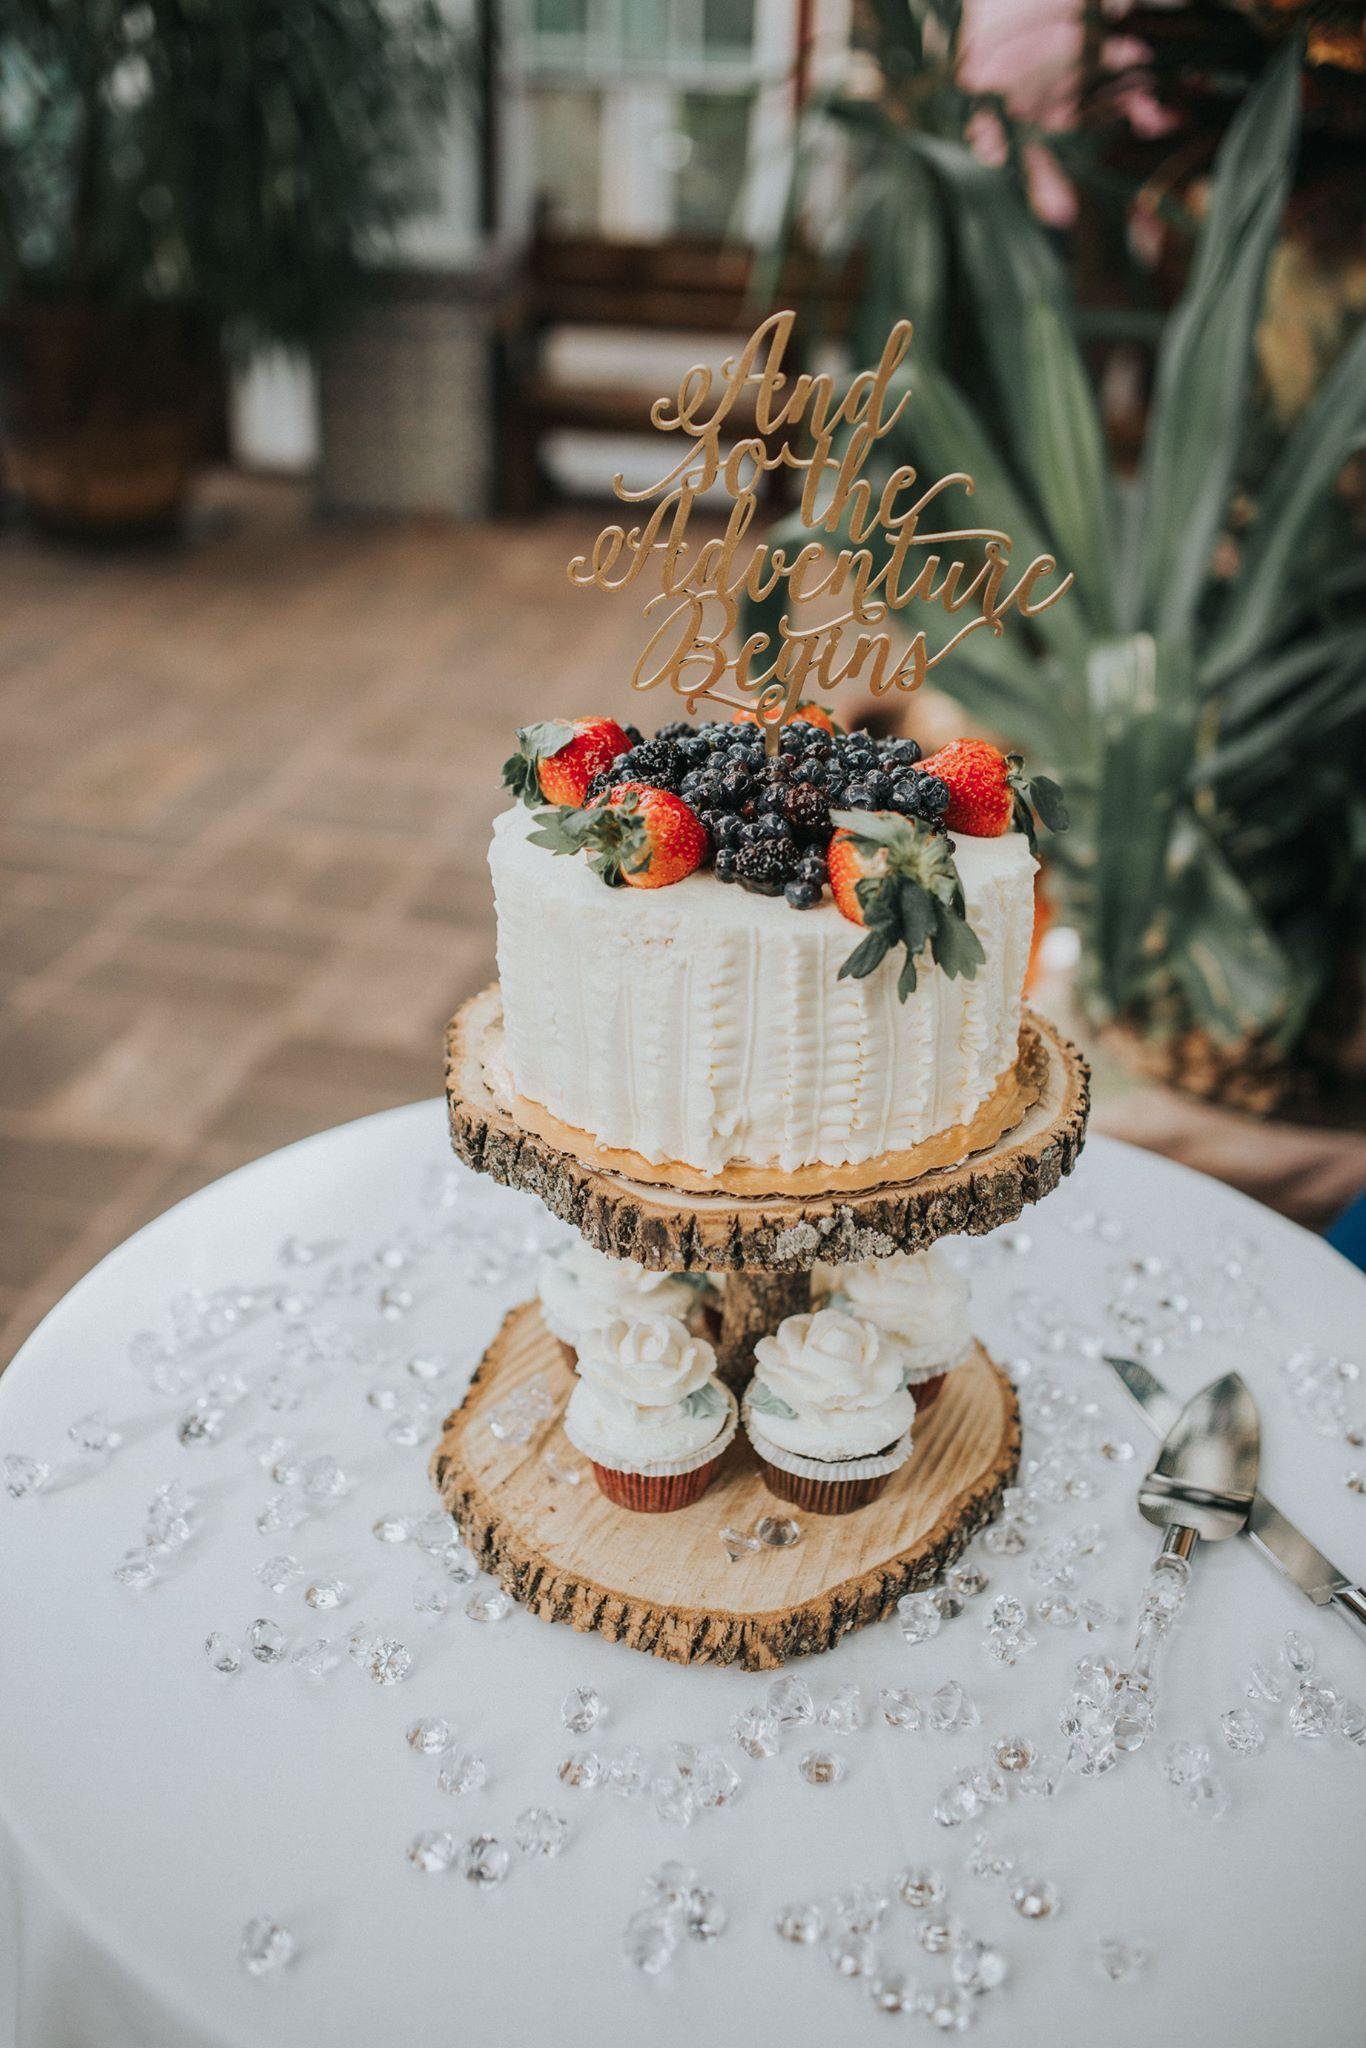 Wedding cake, Whole Foods, berry chantilly, wood cake